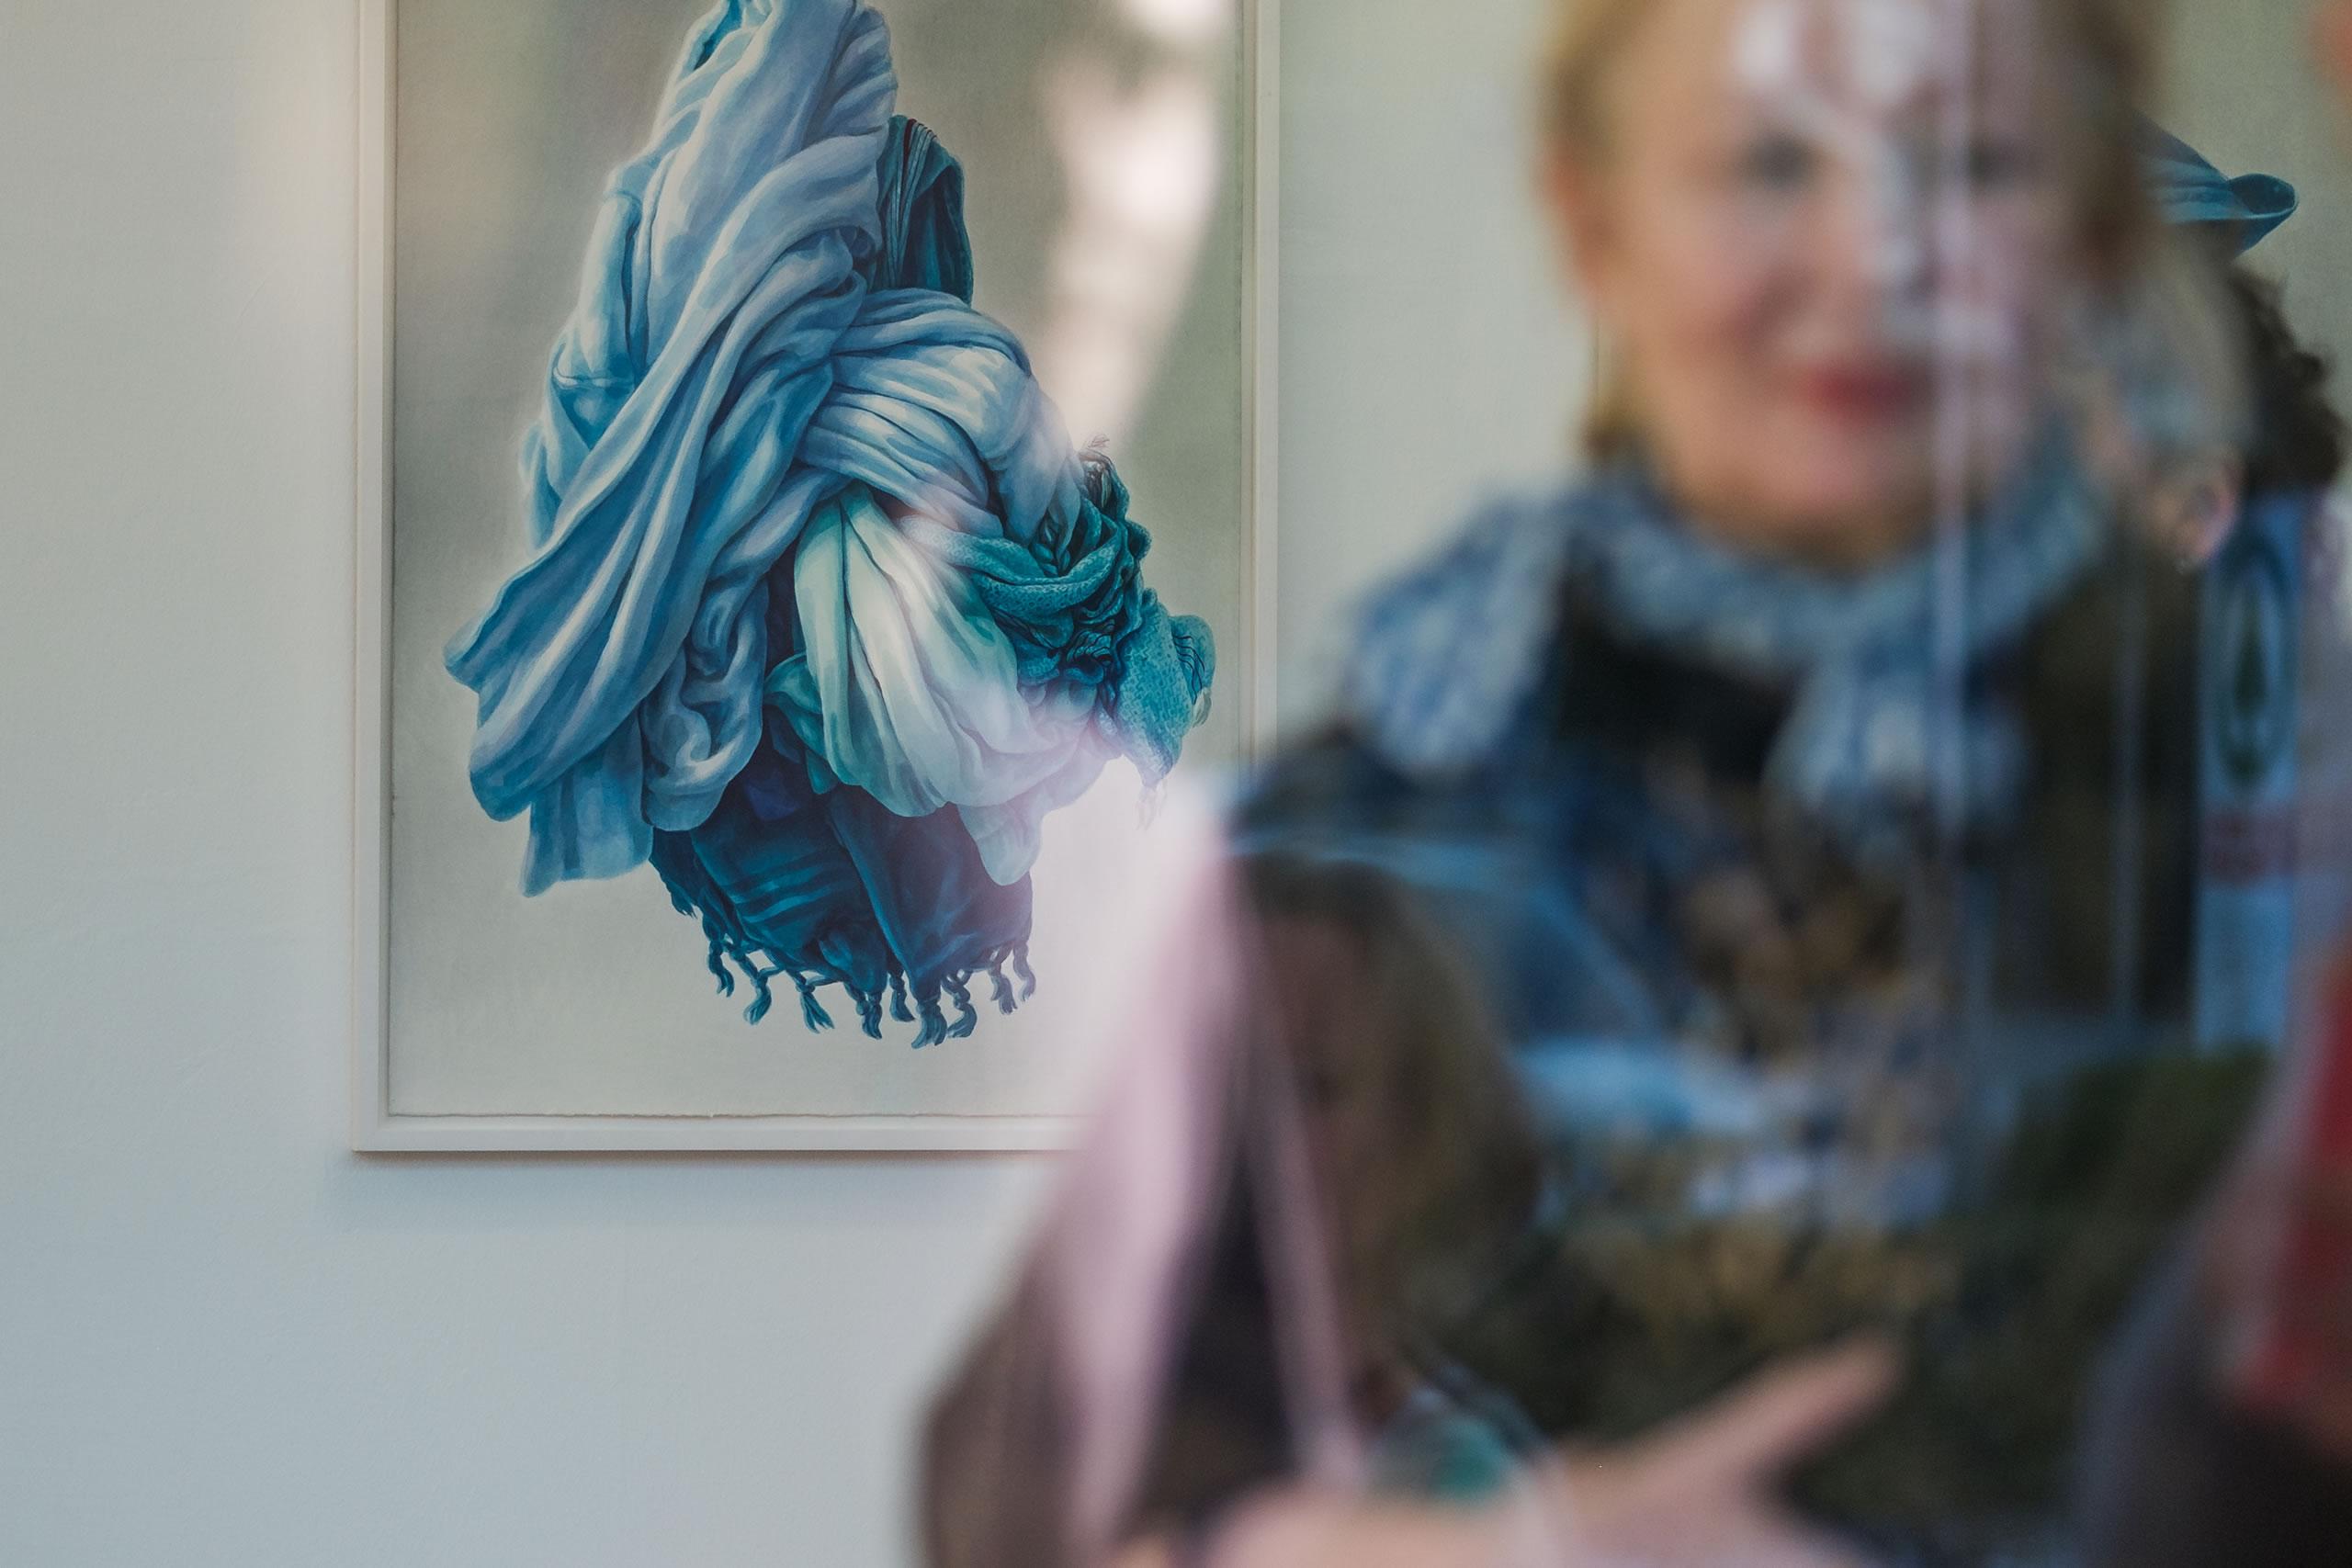 Foto: Manu Lasnik | Galerie3 Velden